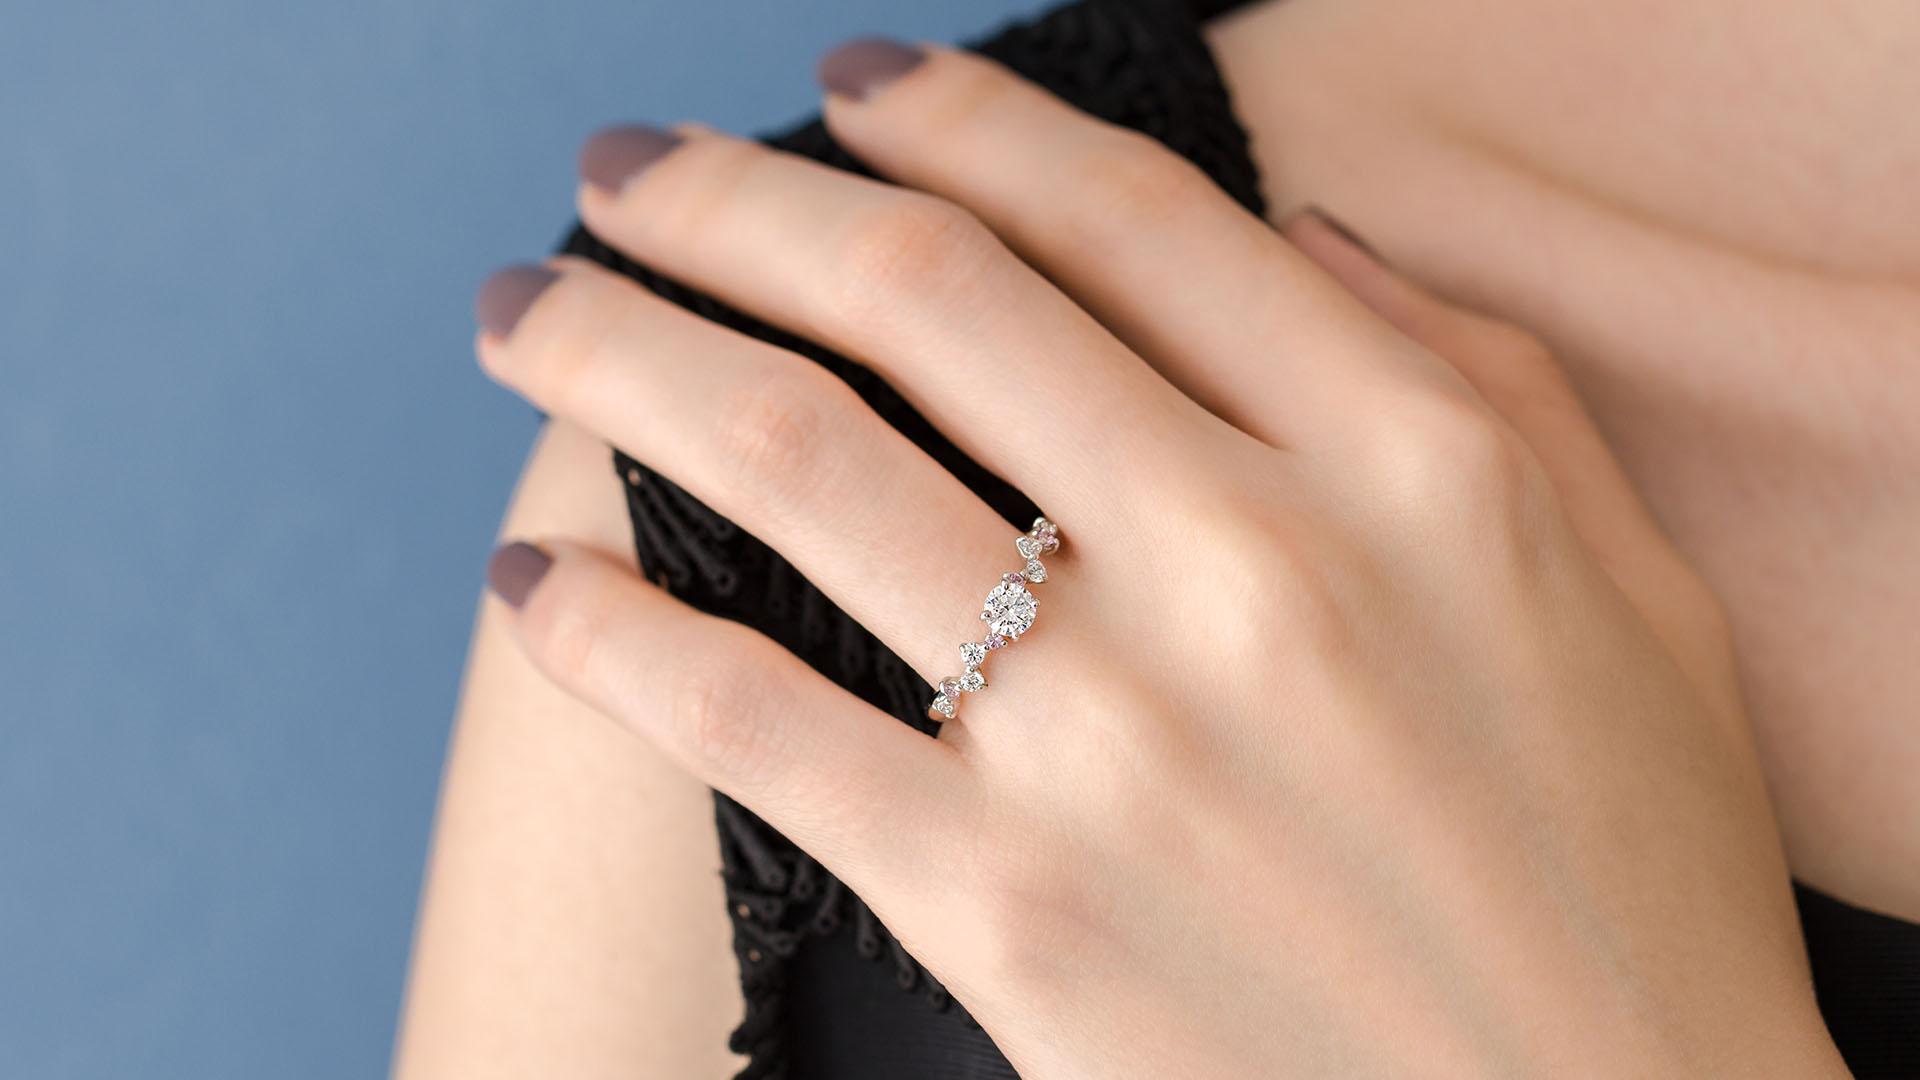 aries アリエス | 婚約指輪サムネイル 3